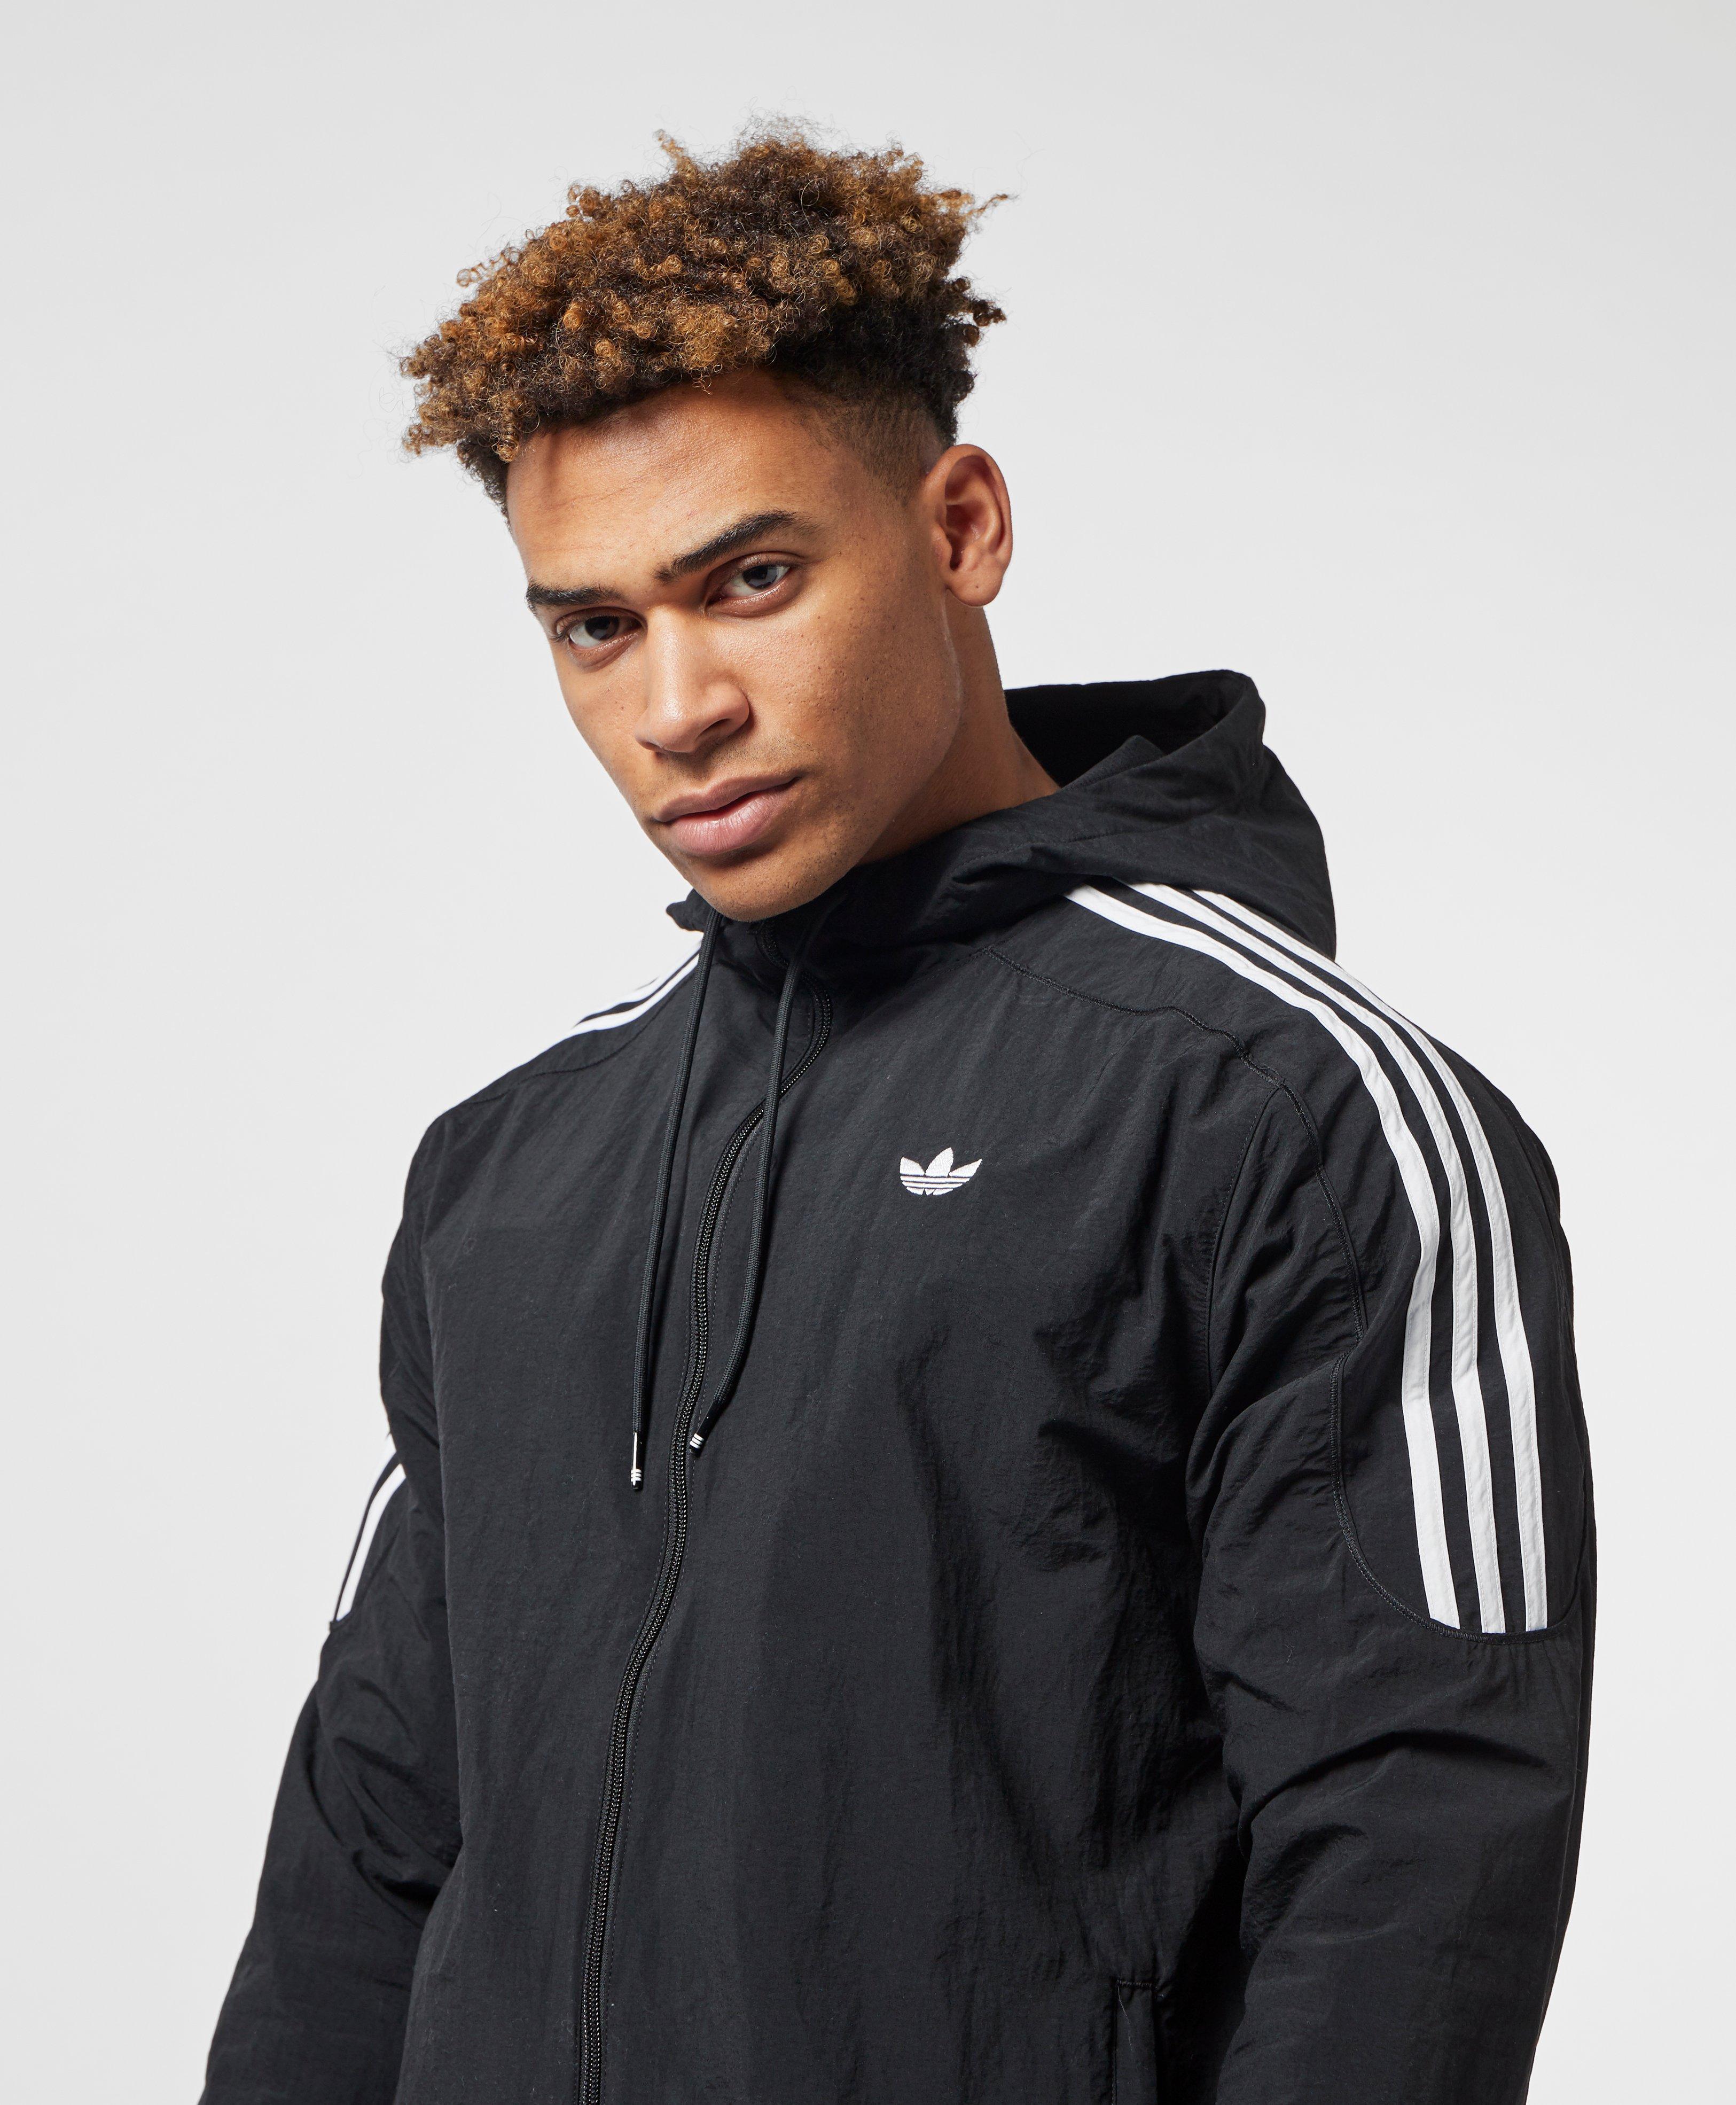 b4f9c6eb Adidas Originals Black Radkin Windbreaker Jacket for men